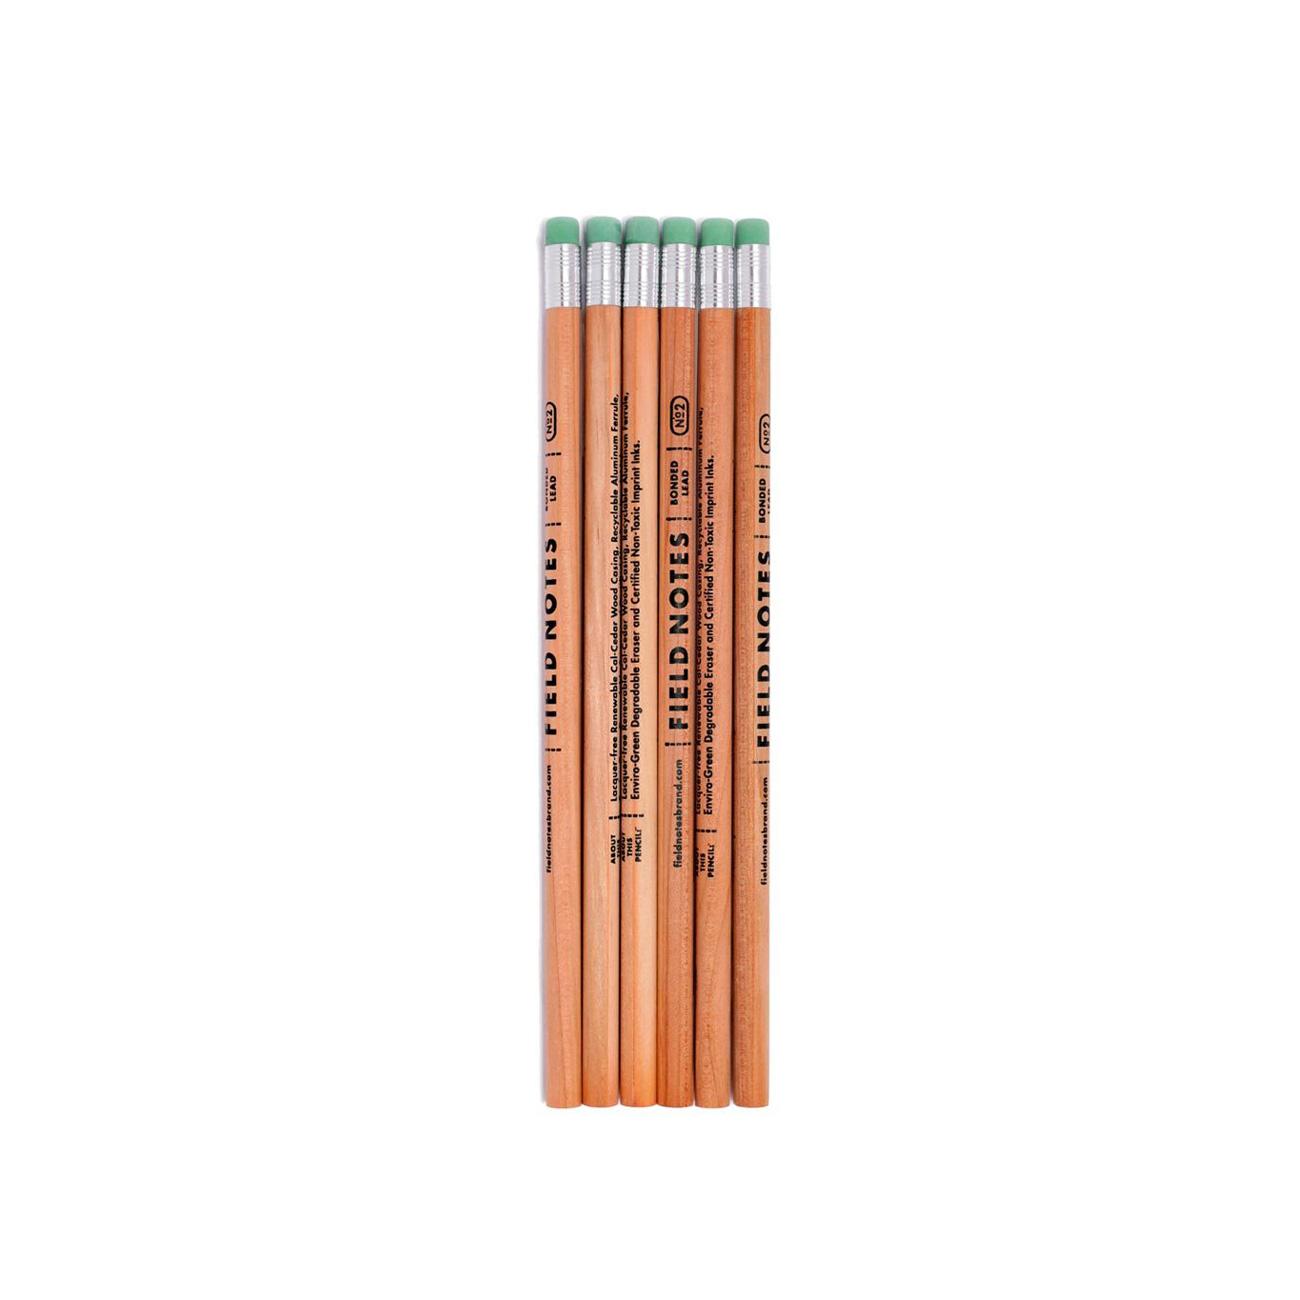 Field Notes, Bleistift, Naturholz, bedruckt, mit Radiergummi, grün